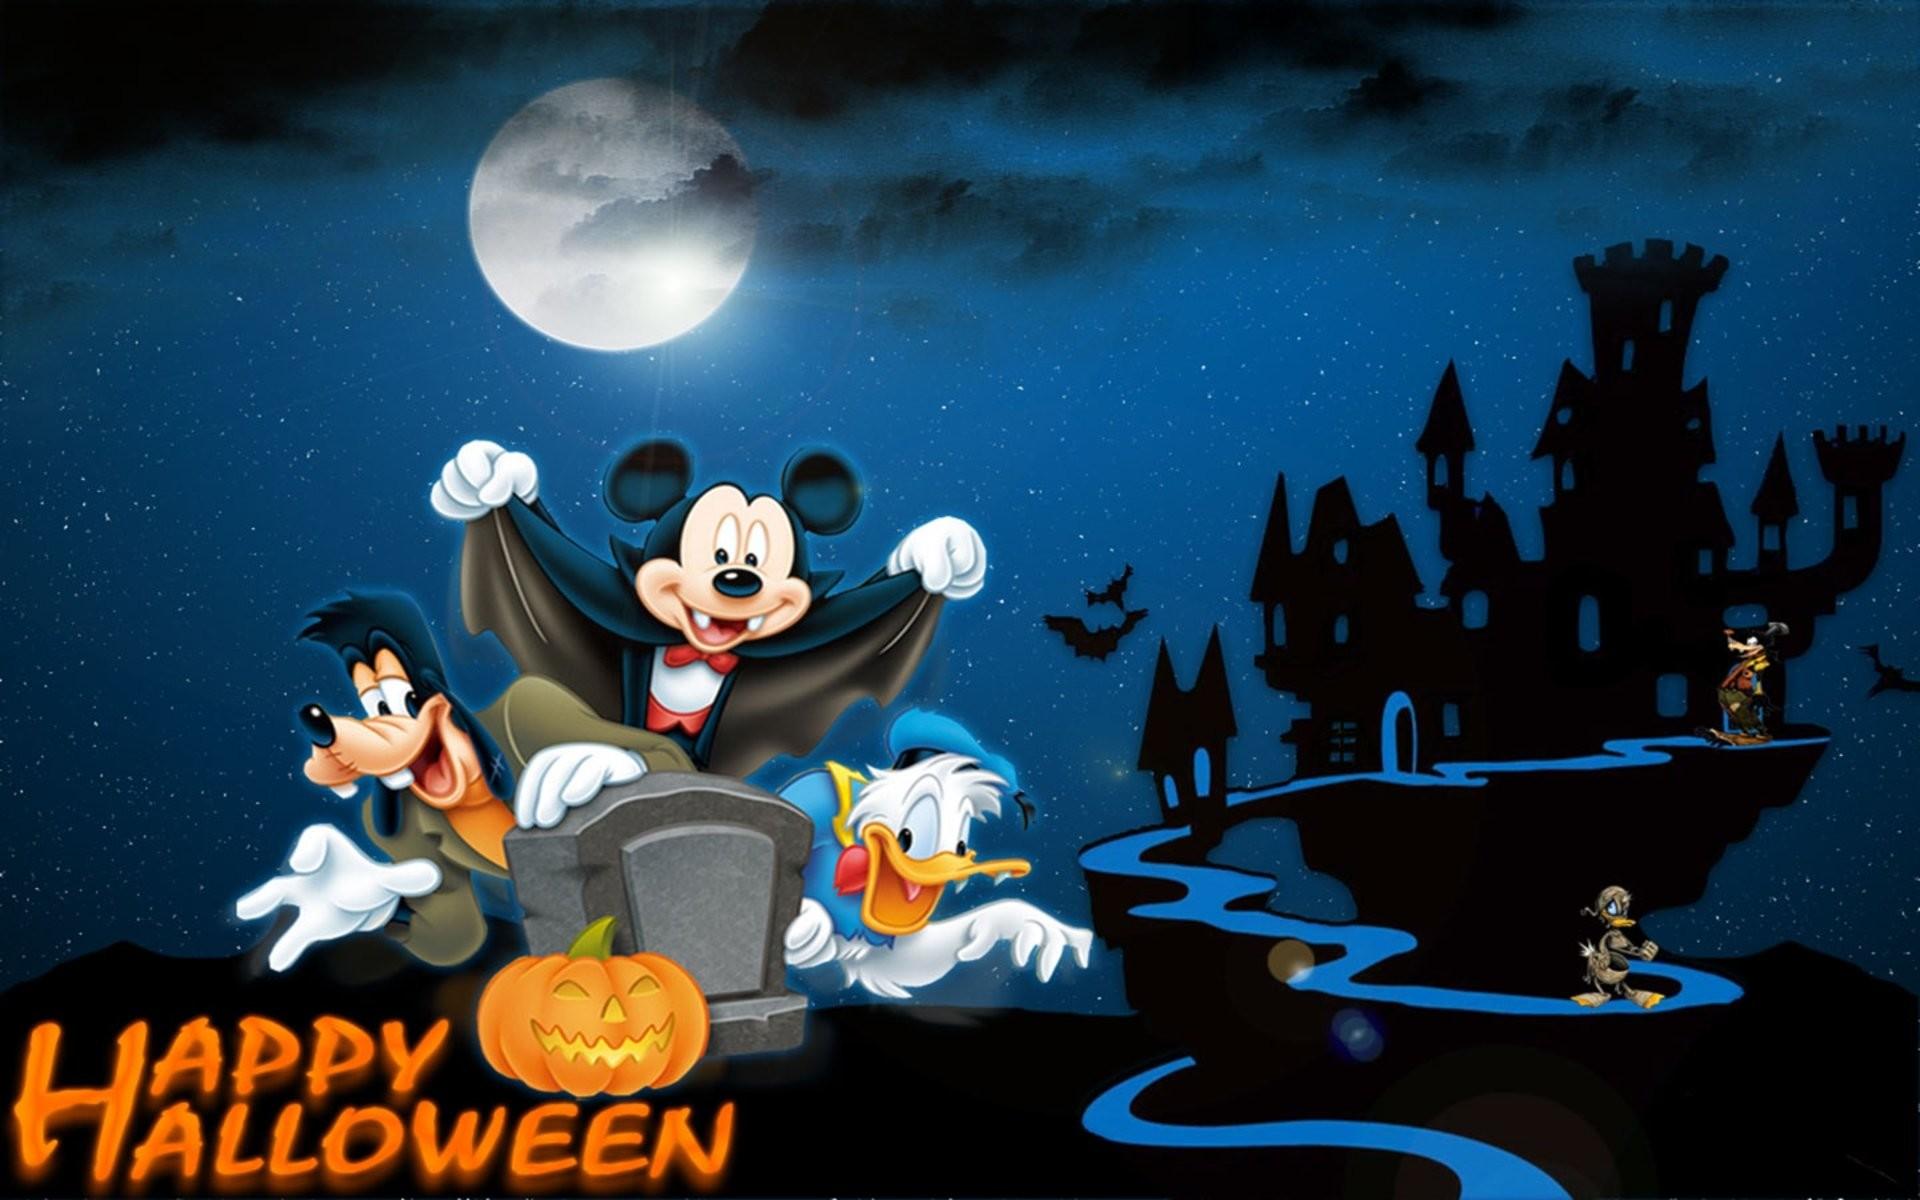 Free Download Disney Halloween HD Pictures.